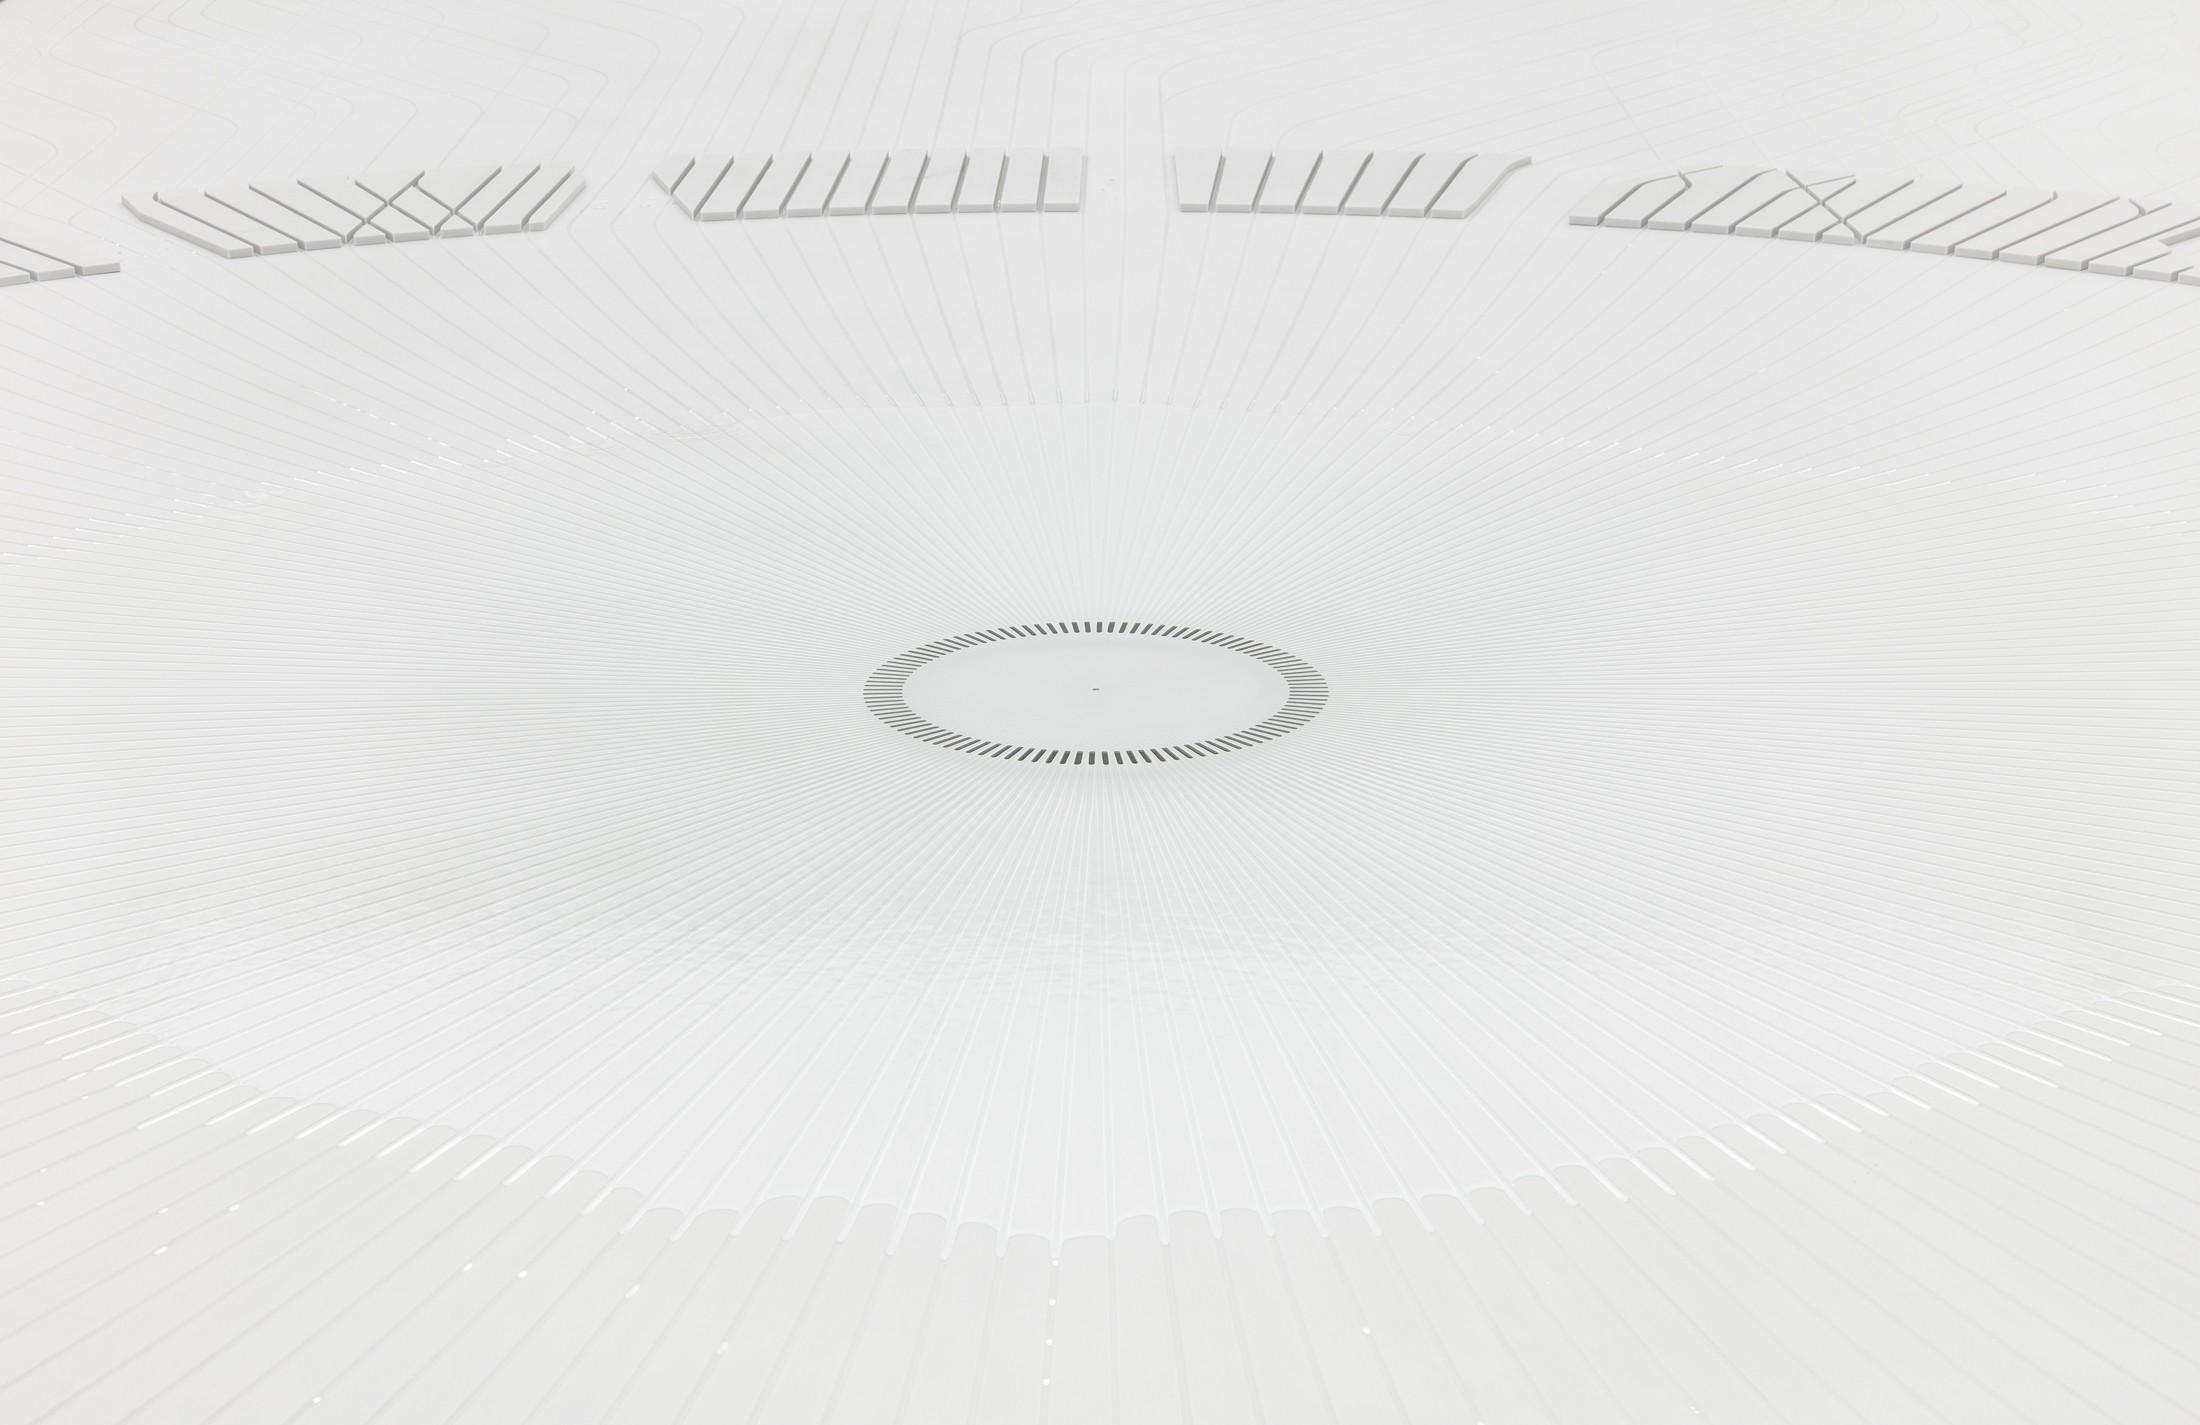 Asif-Khan-PyeongChang-Winter-Olympics_013-2200x1425.jpg